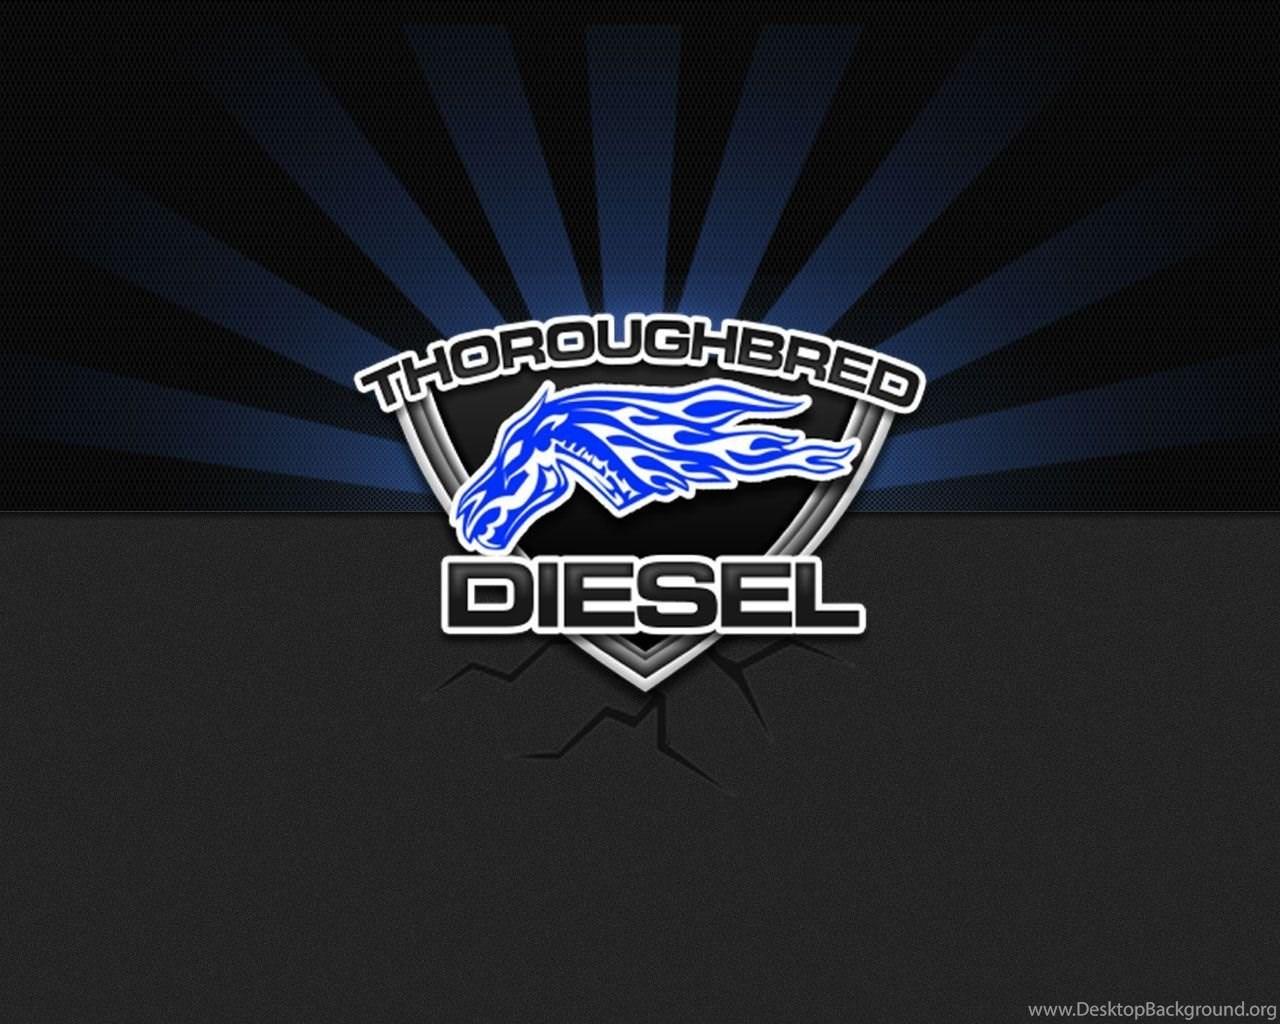 Thoroughbred Diesel Wallpapers Download Desktop Background